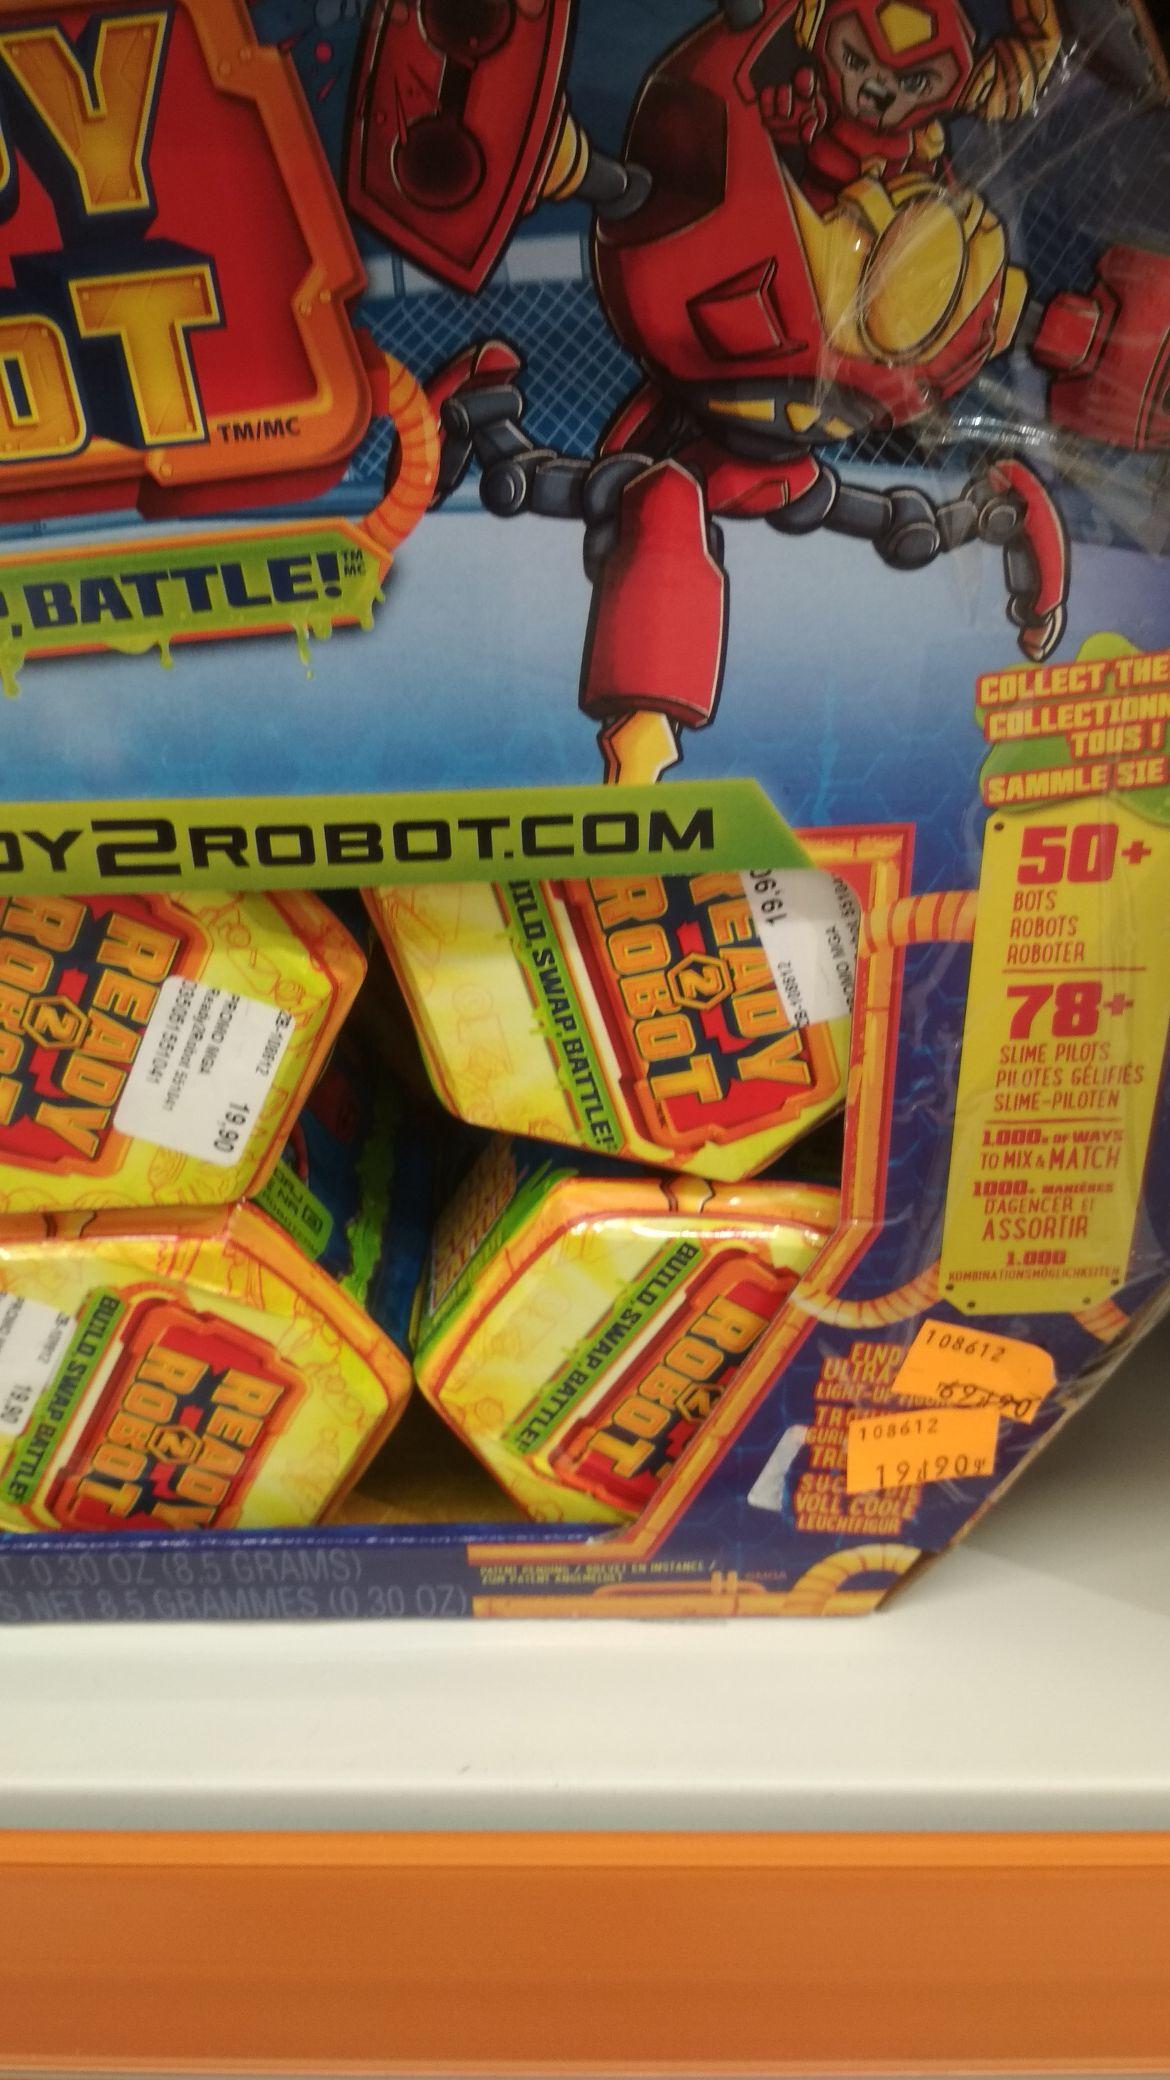 Ready 2 robot mlociny świat zabawek